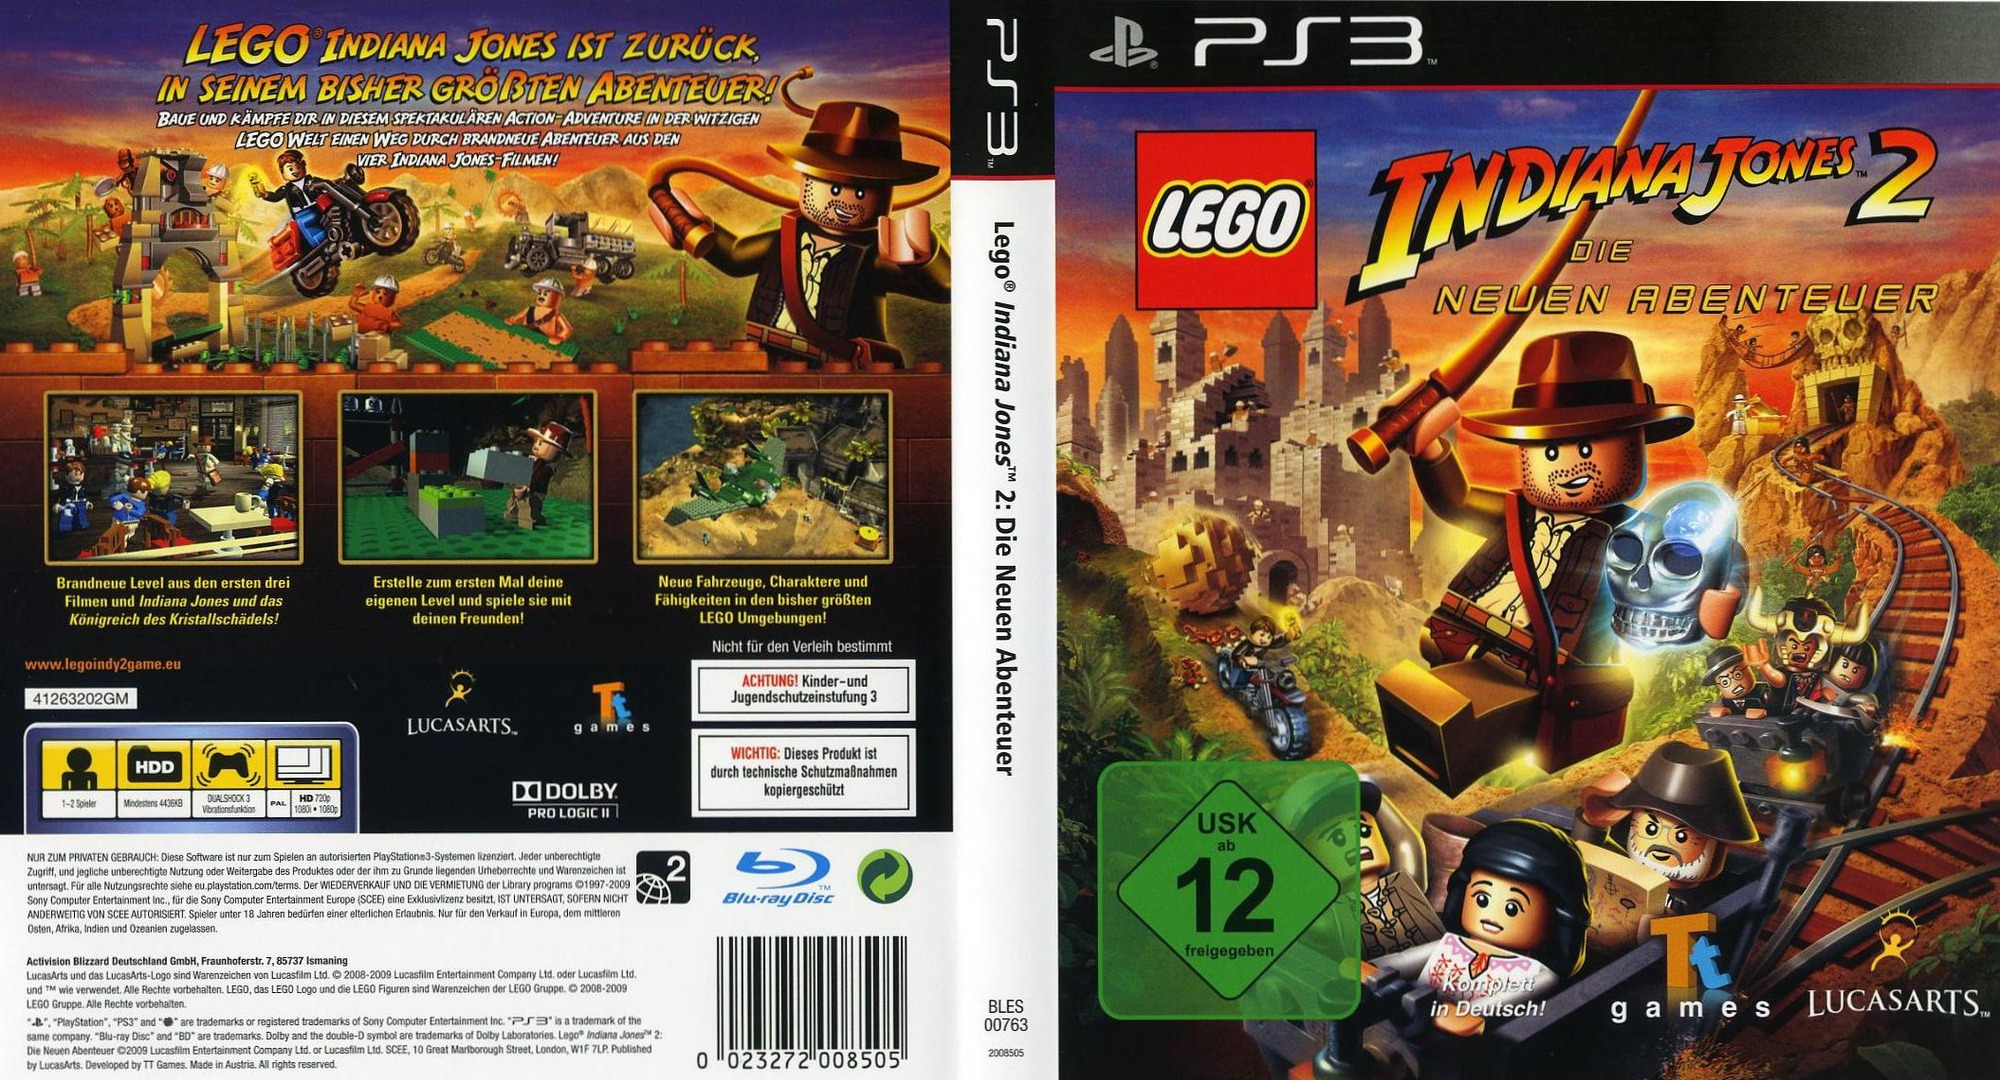 LEGO Indiana Jones 2: Die Neuen Abenteuer PS3 coverfullHQ (BLES00763)